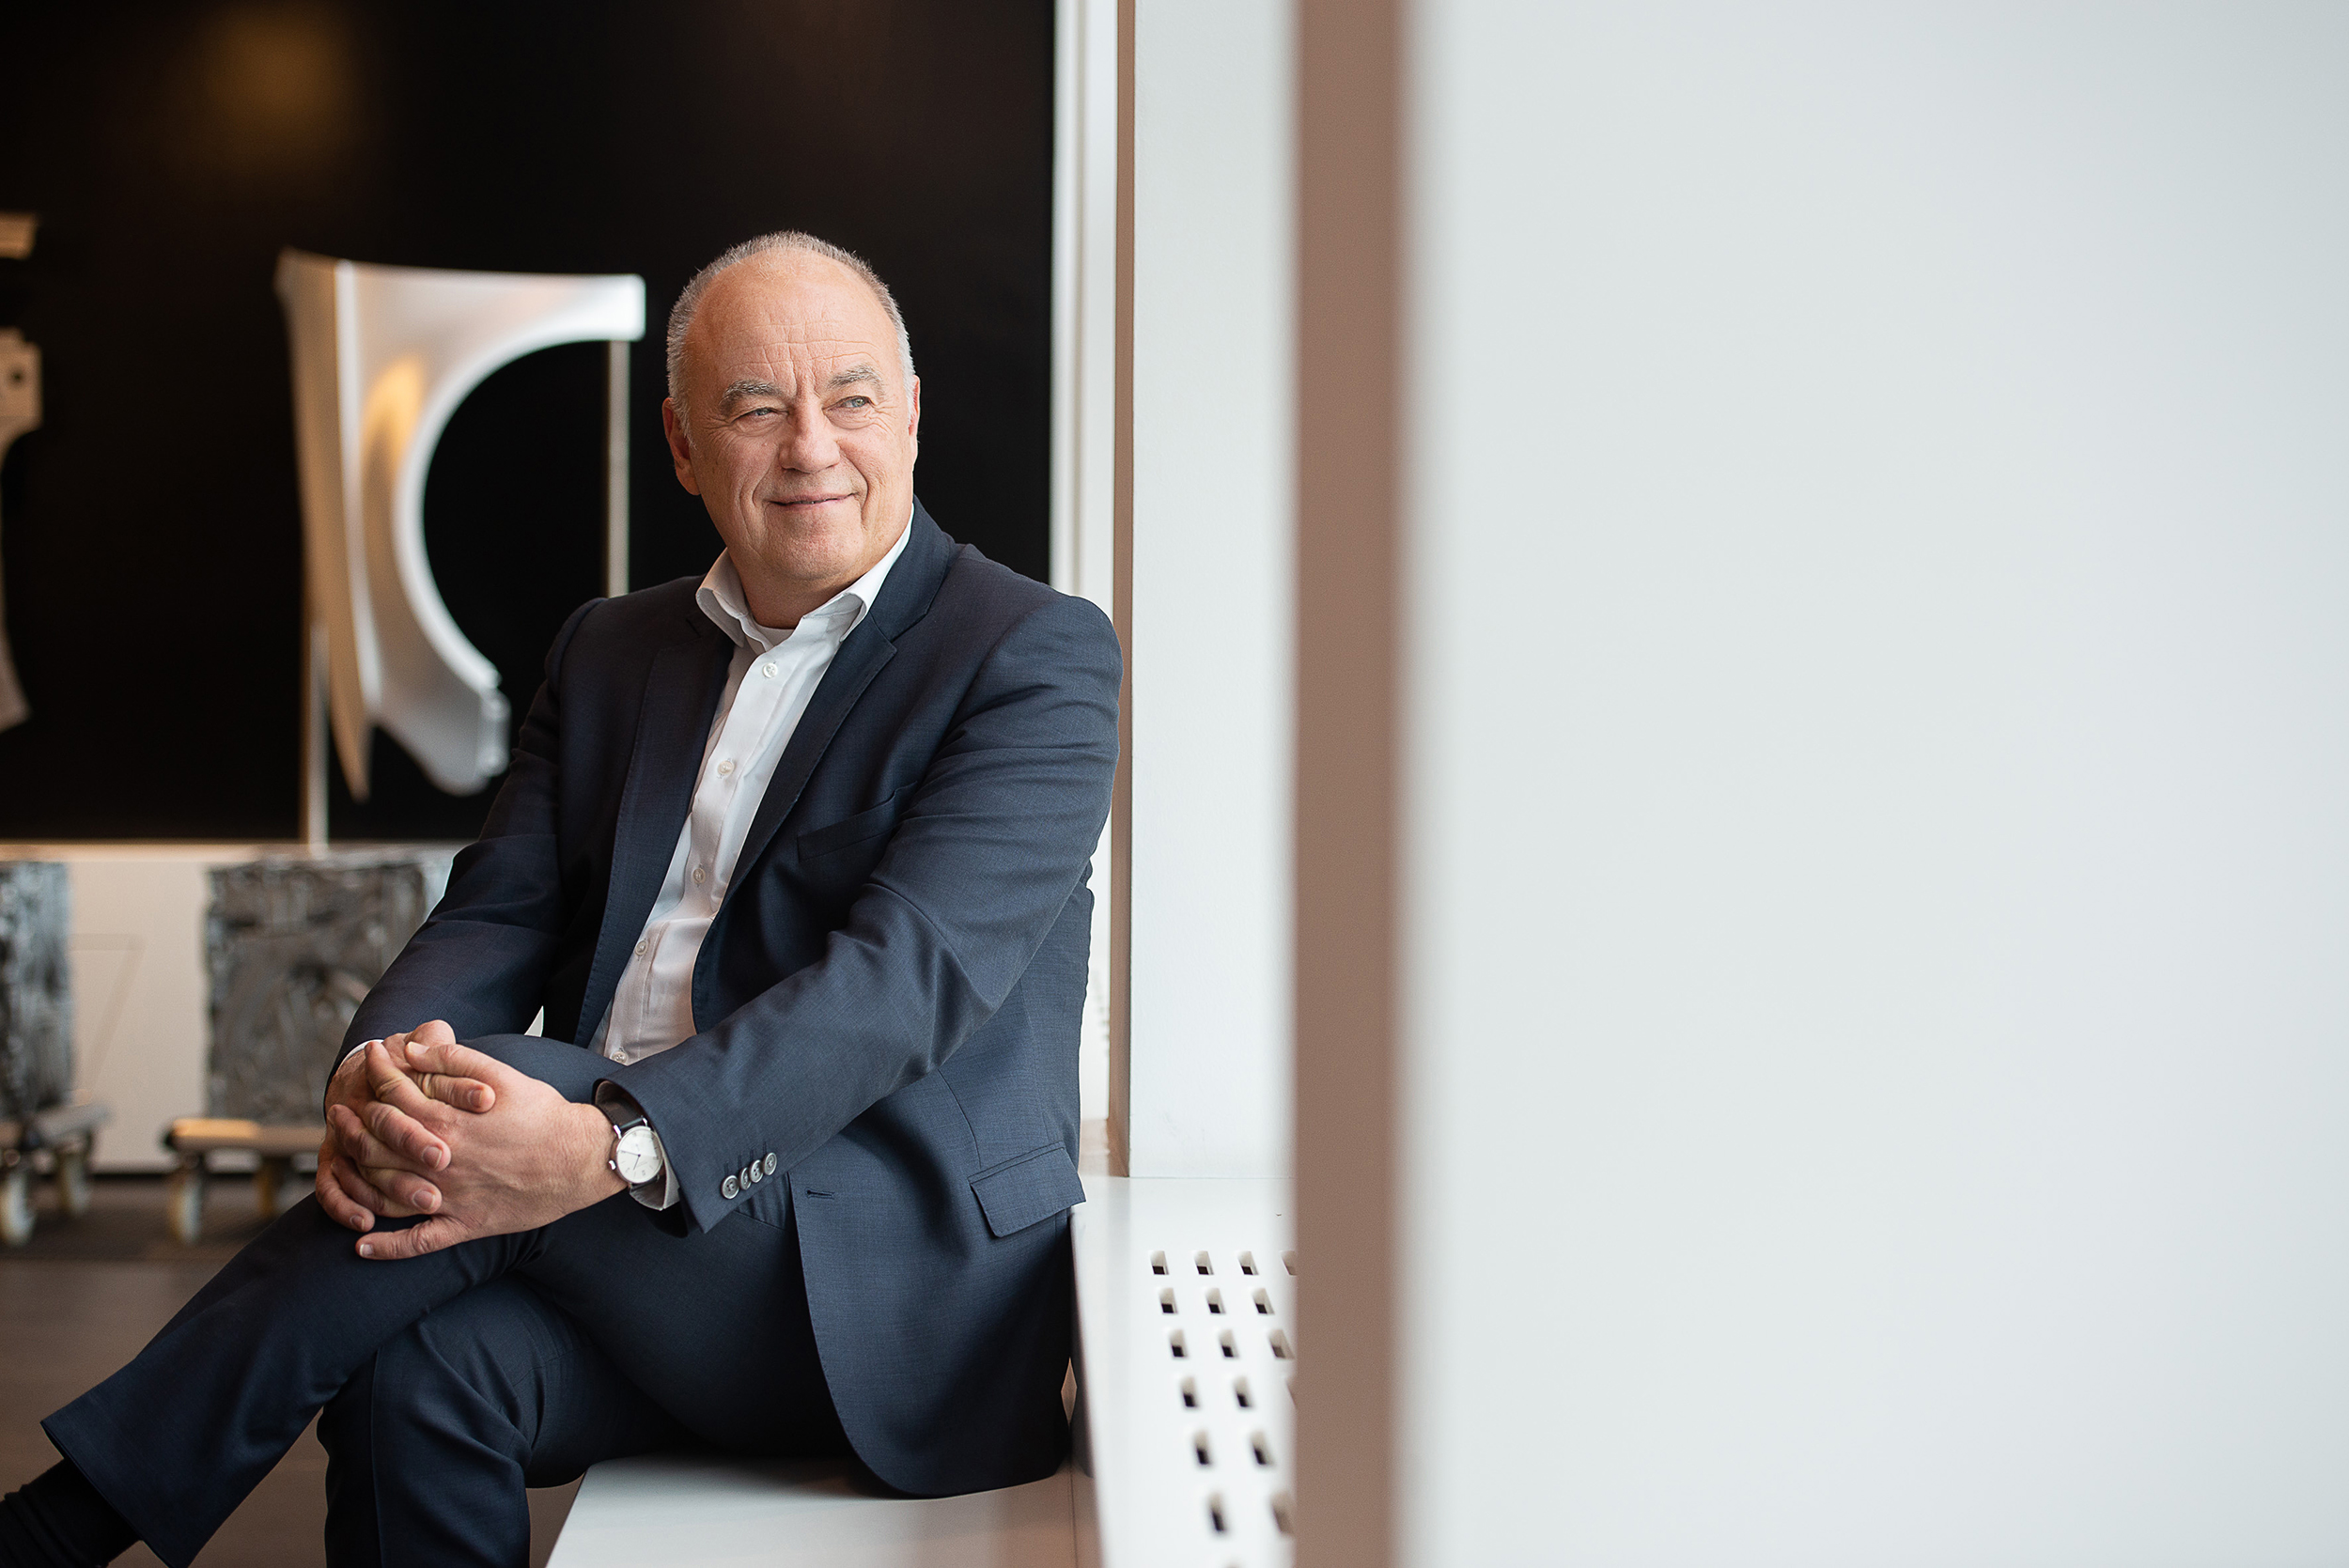 Peter Kössler, Board Member in charge of production, Audi AG